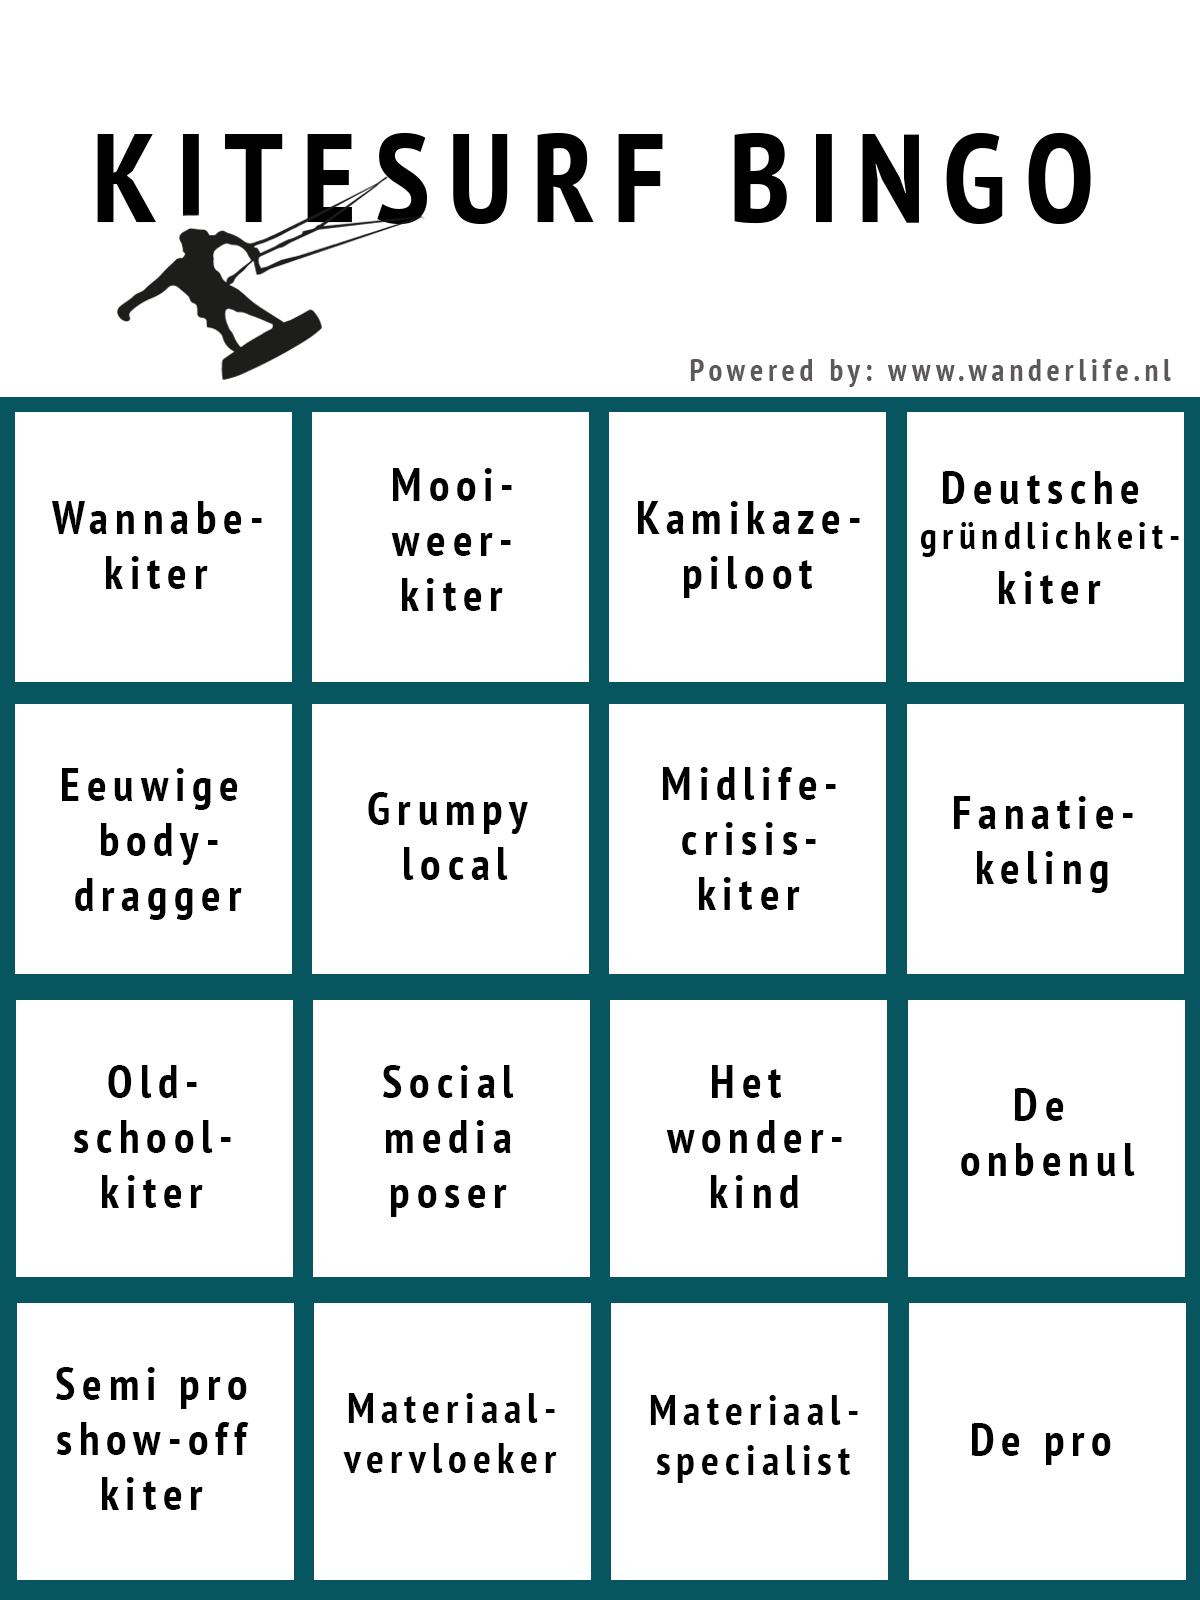 Kitesurf Bingo NL